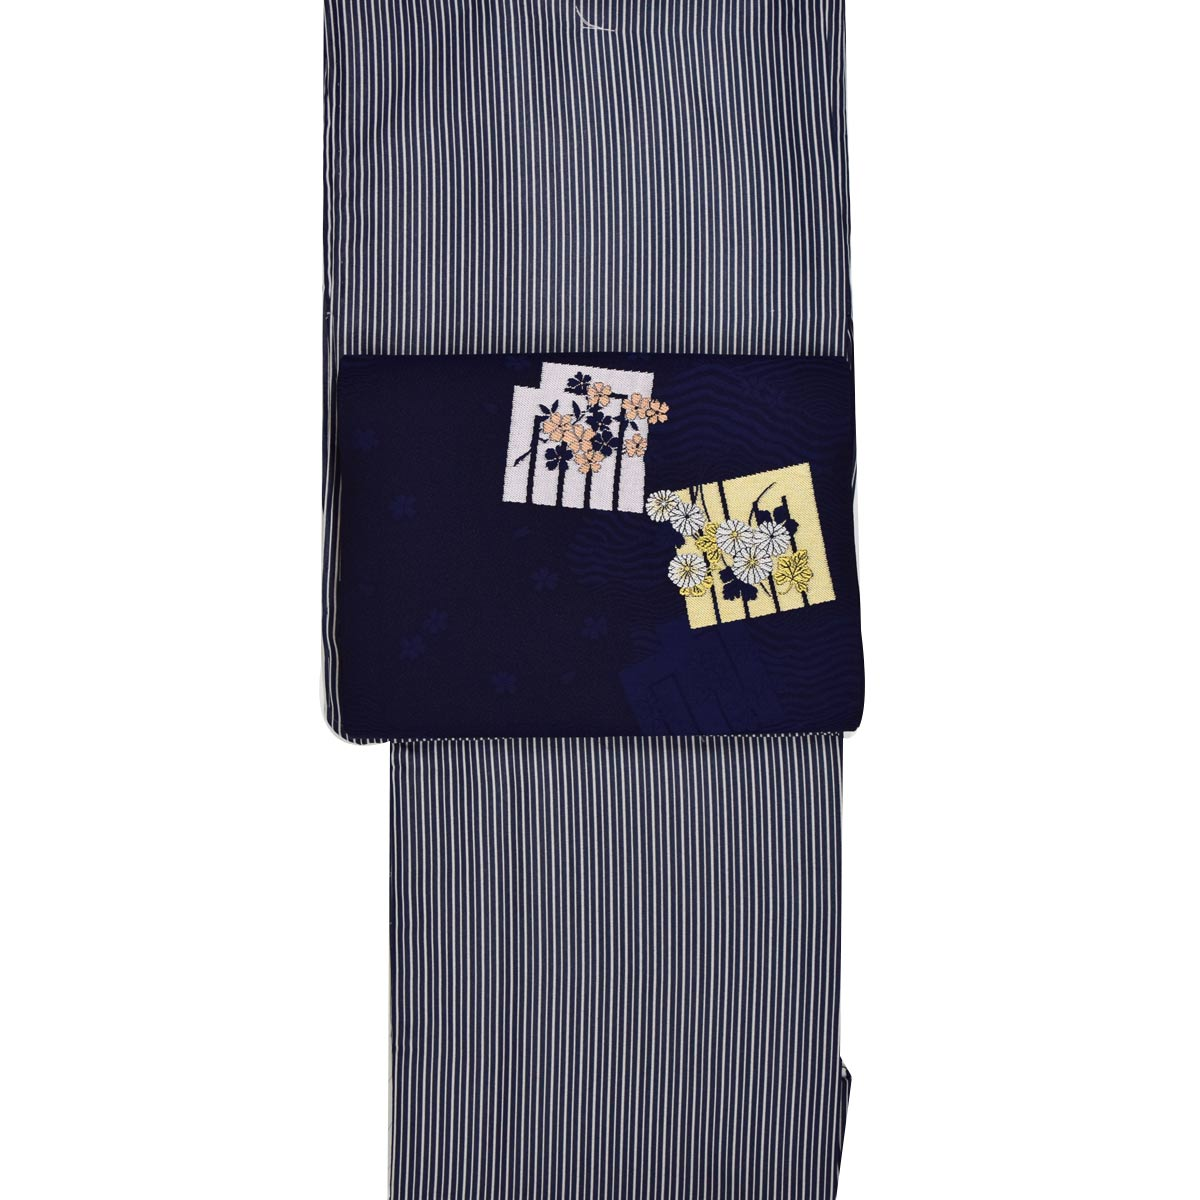 【M寸】洗える着物 セット【 単衣 】 洗える着物【 江戸小紋 】+ 正絹九寸名古屋帯【少々難あり】番号d808-23【h805】